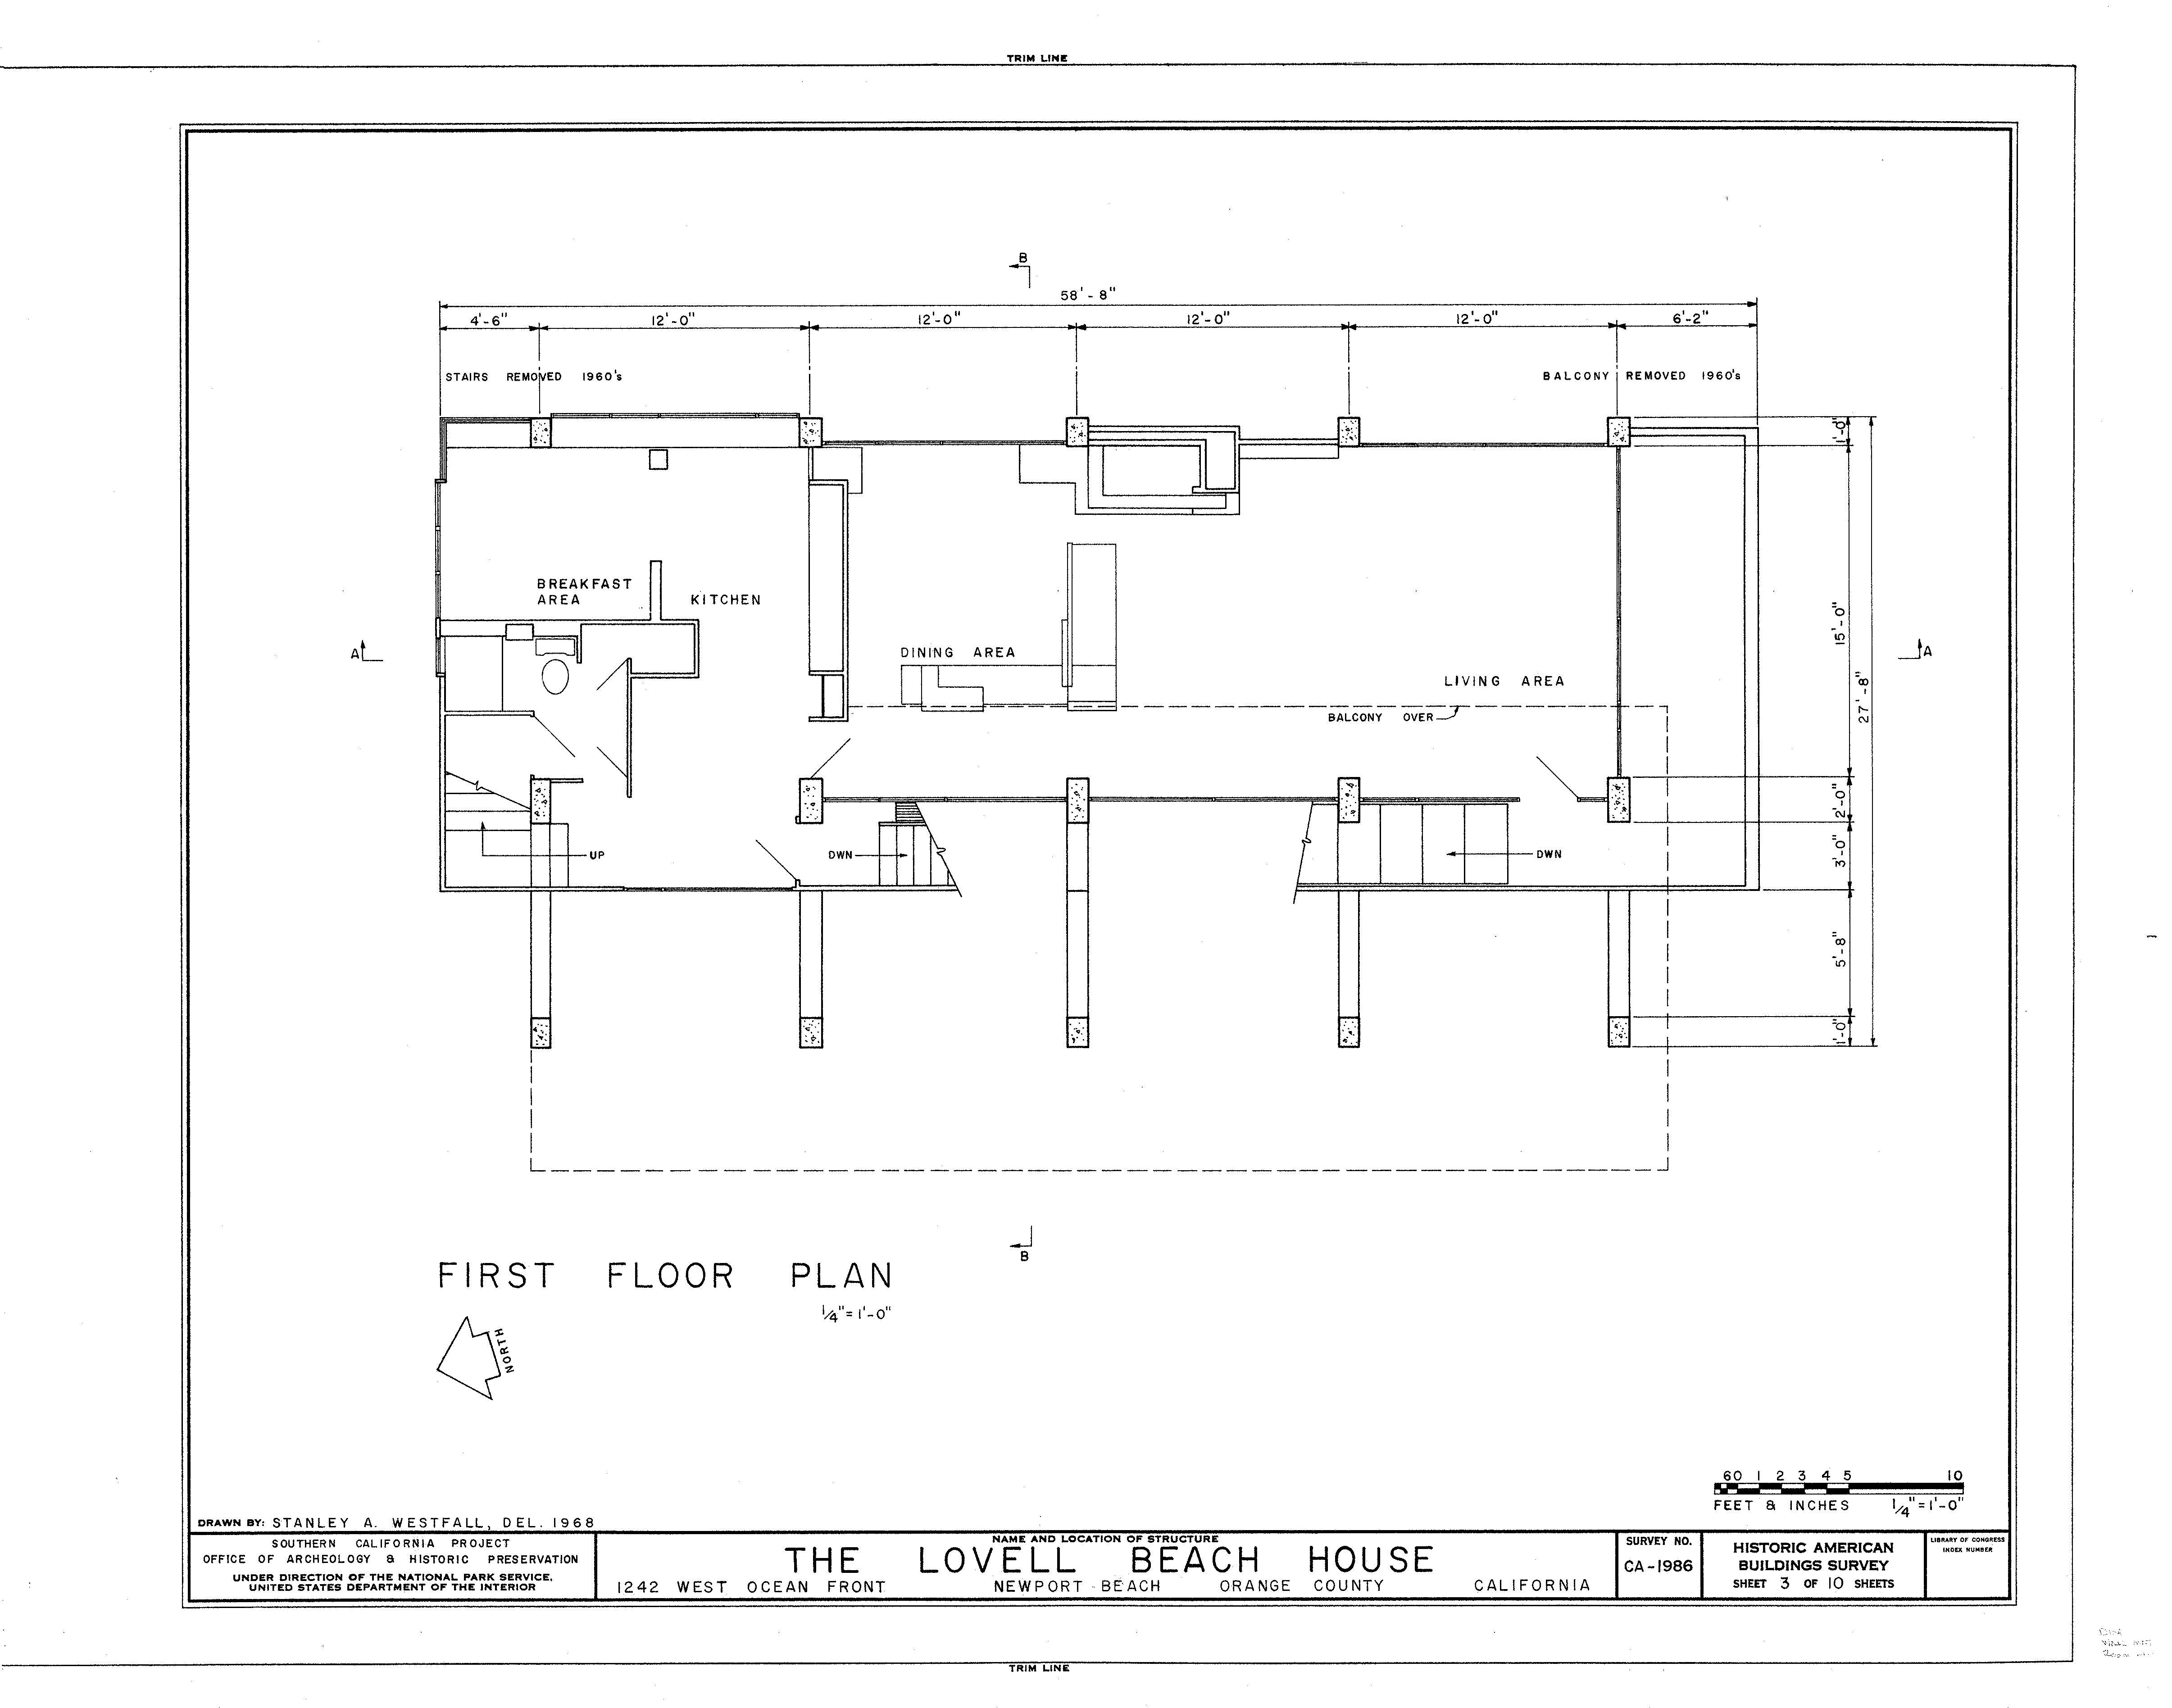 Casa lovell en la playa plano 3 wikiarquitectura - Plano de la casa ...